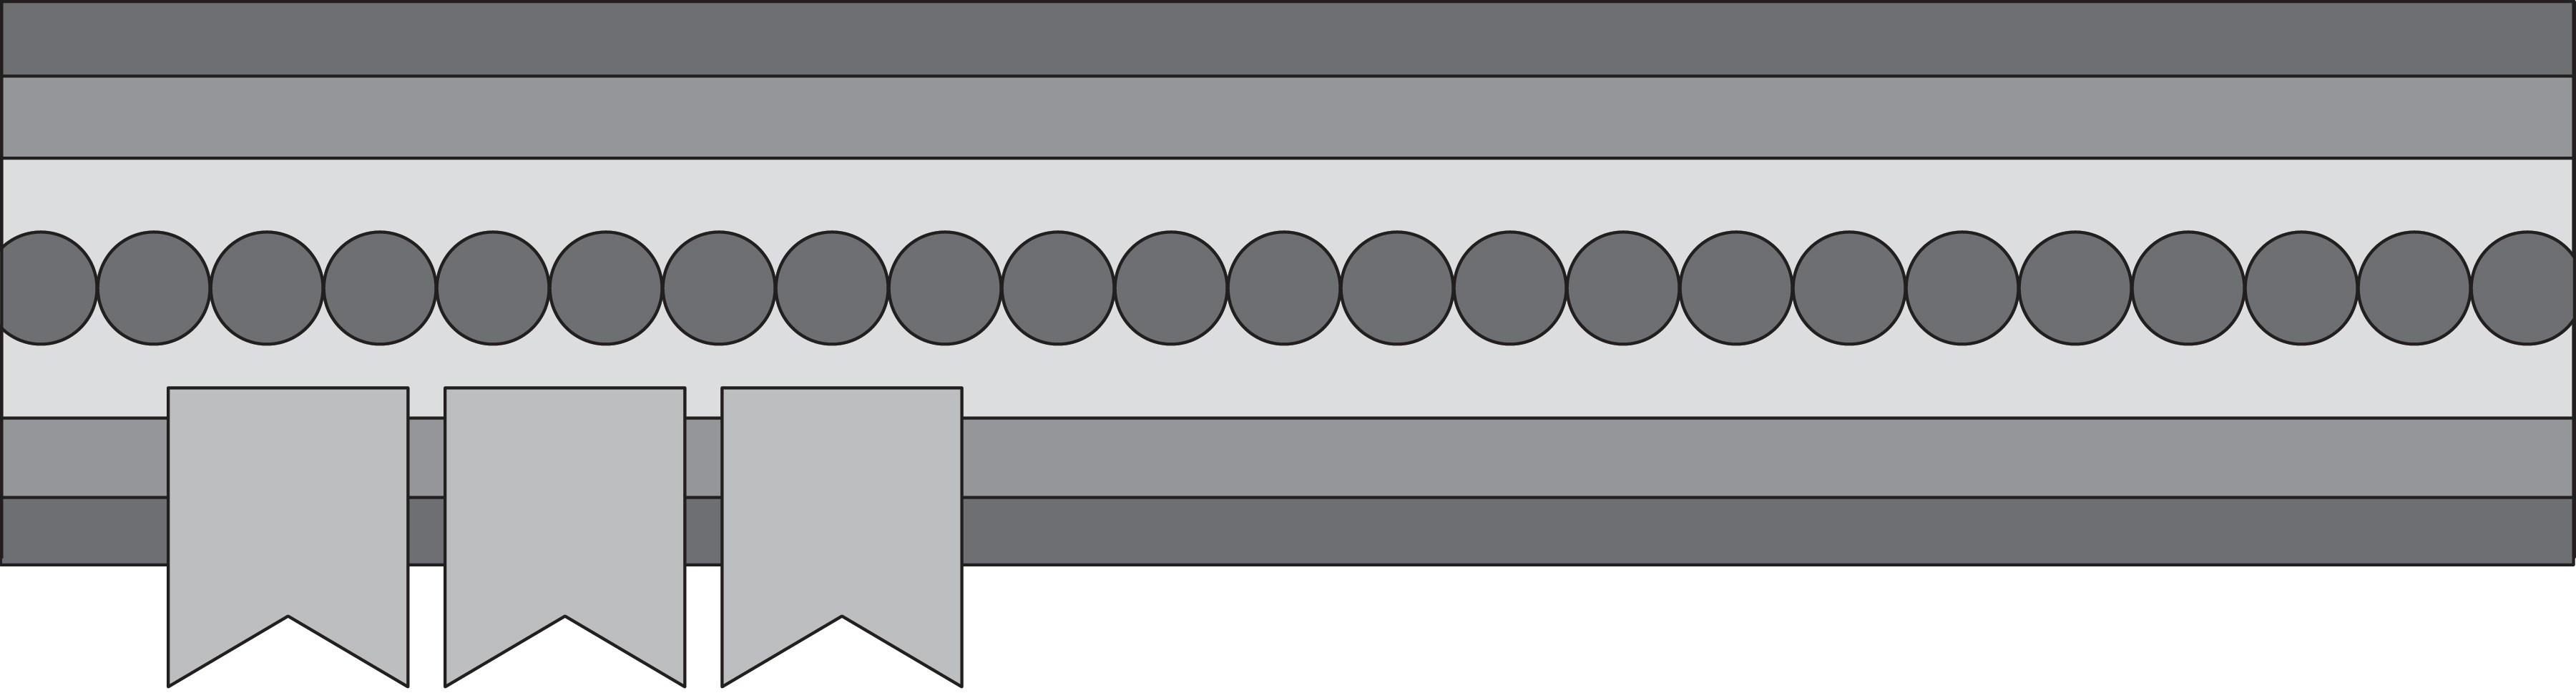 borderrecipe_sketch_3.jpg